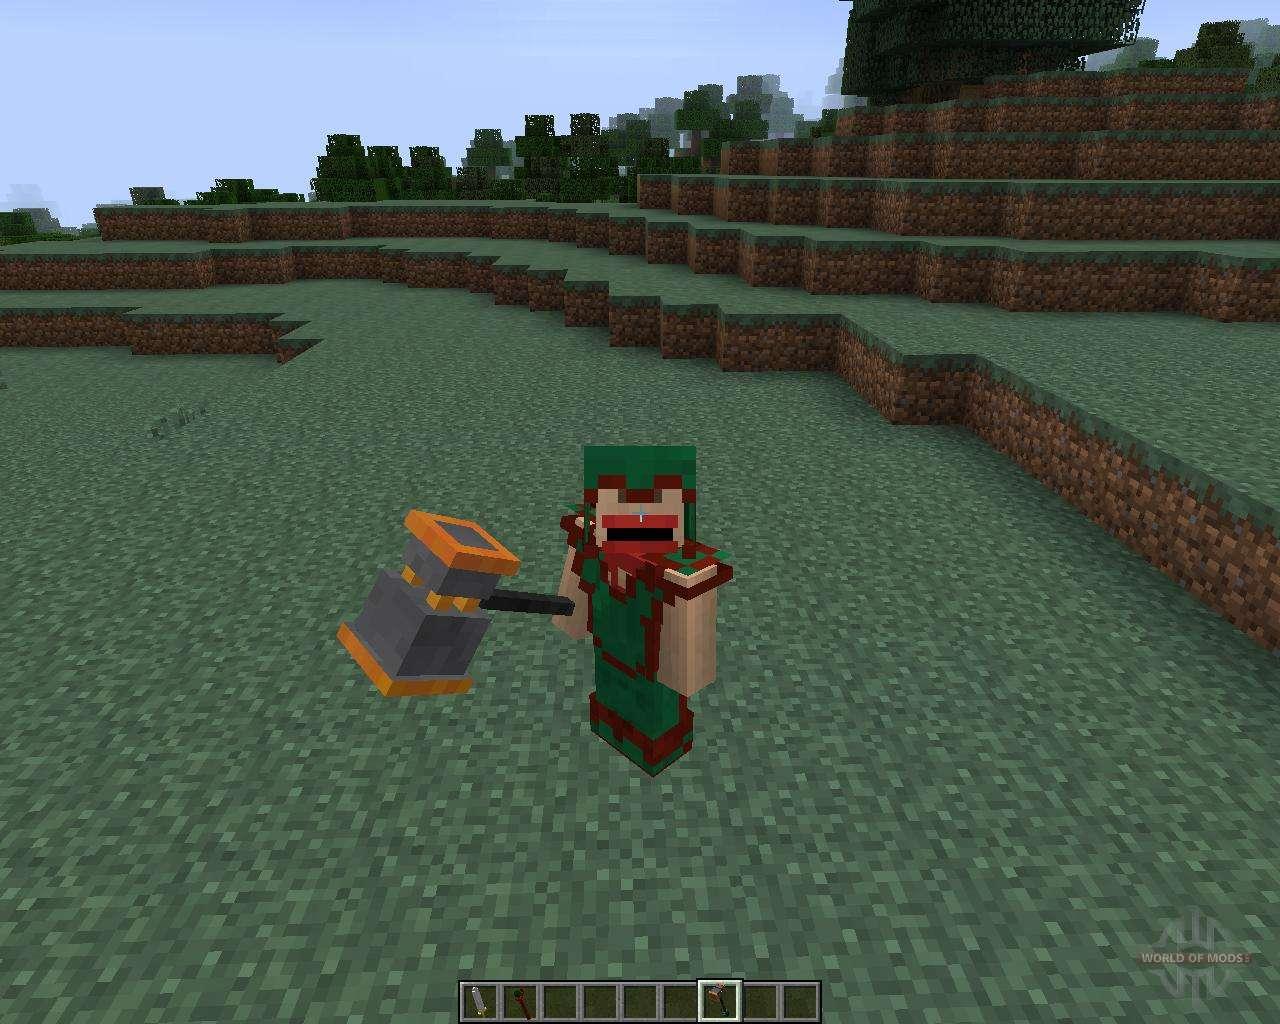 DivineRPG (1.6.4) - Моды на Майнкрафт